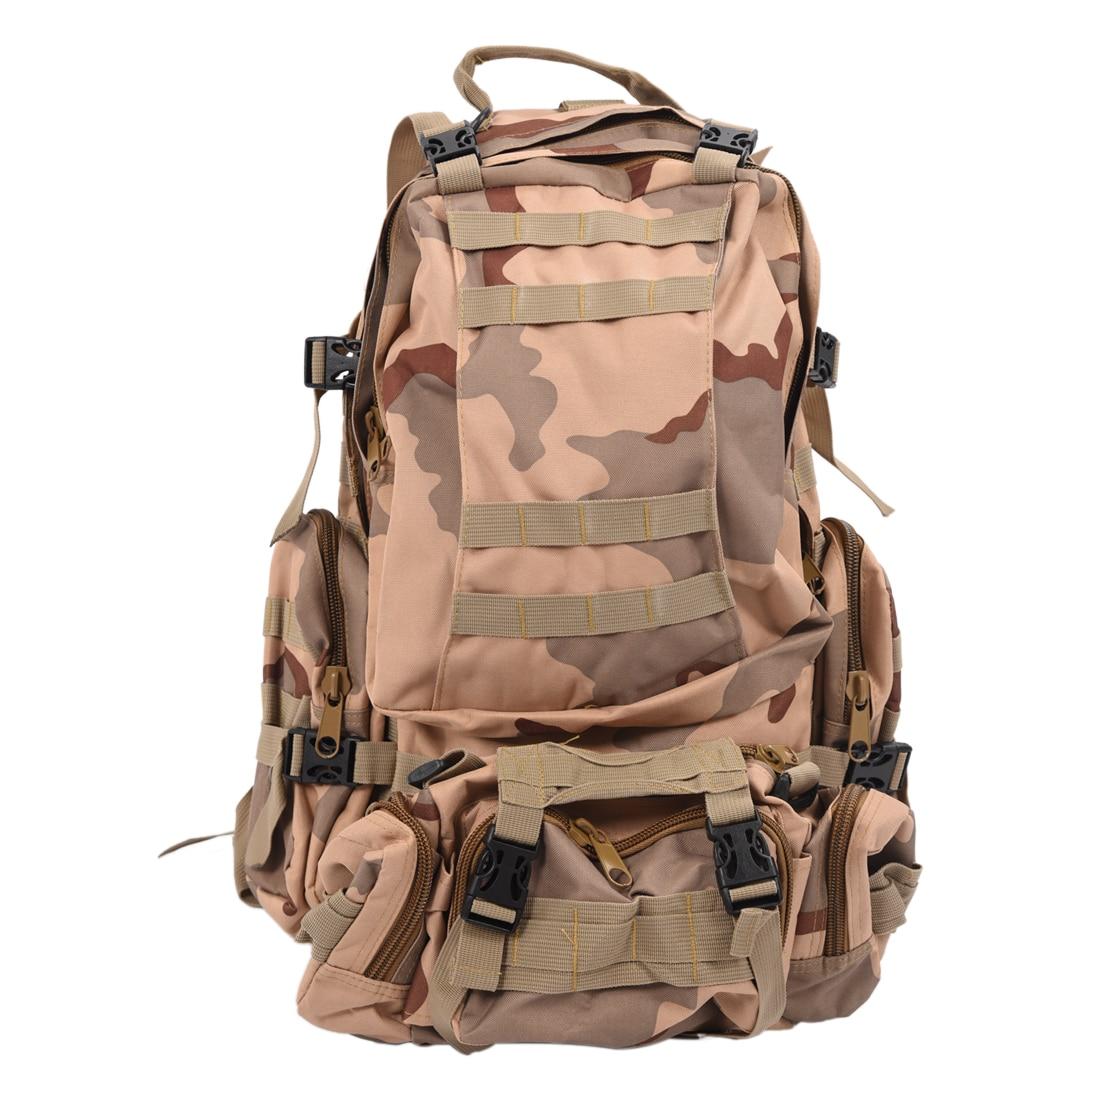 50L Large Capacity Tactical Military Outdoor Rucksacks Backpack Trekking Hiking Bag Three sand camouflage new arrival 38l military tactical backpack 500d molle rucksacks outdoor sport camping trekking bag backpacks cl5 0070